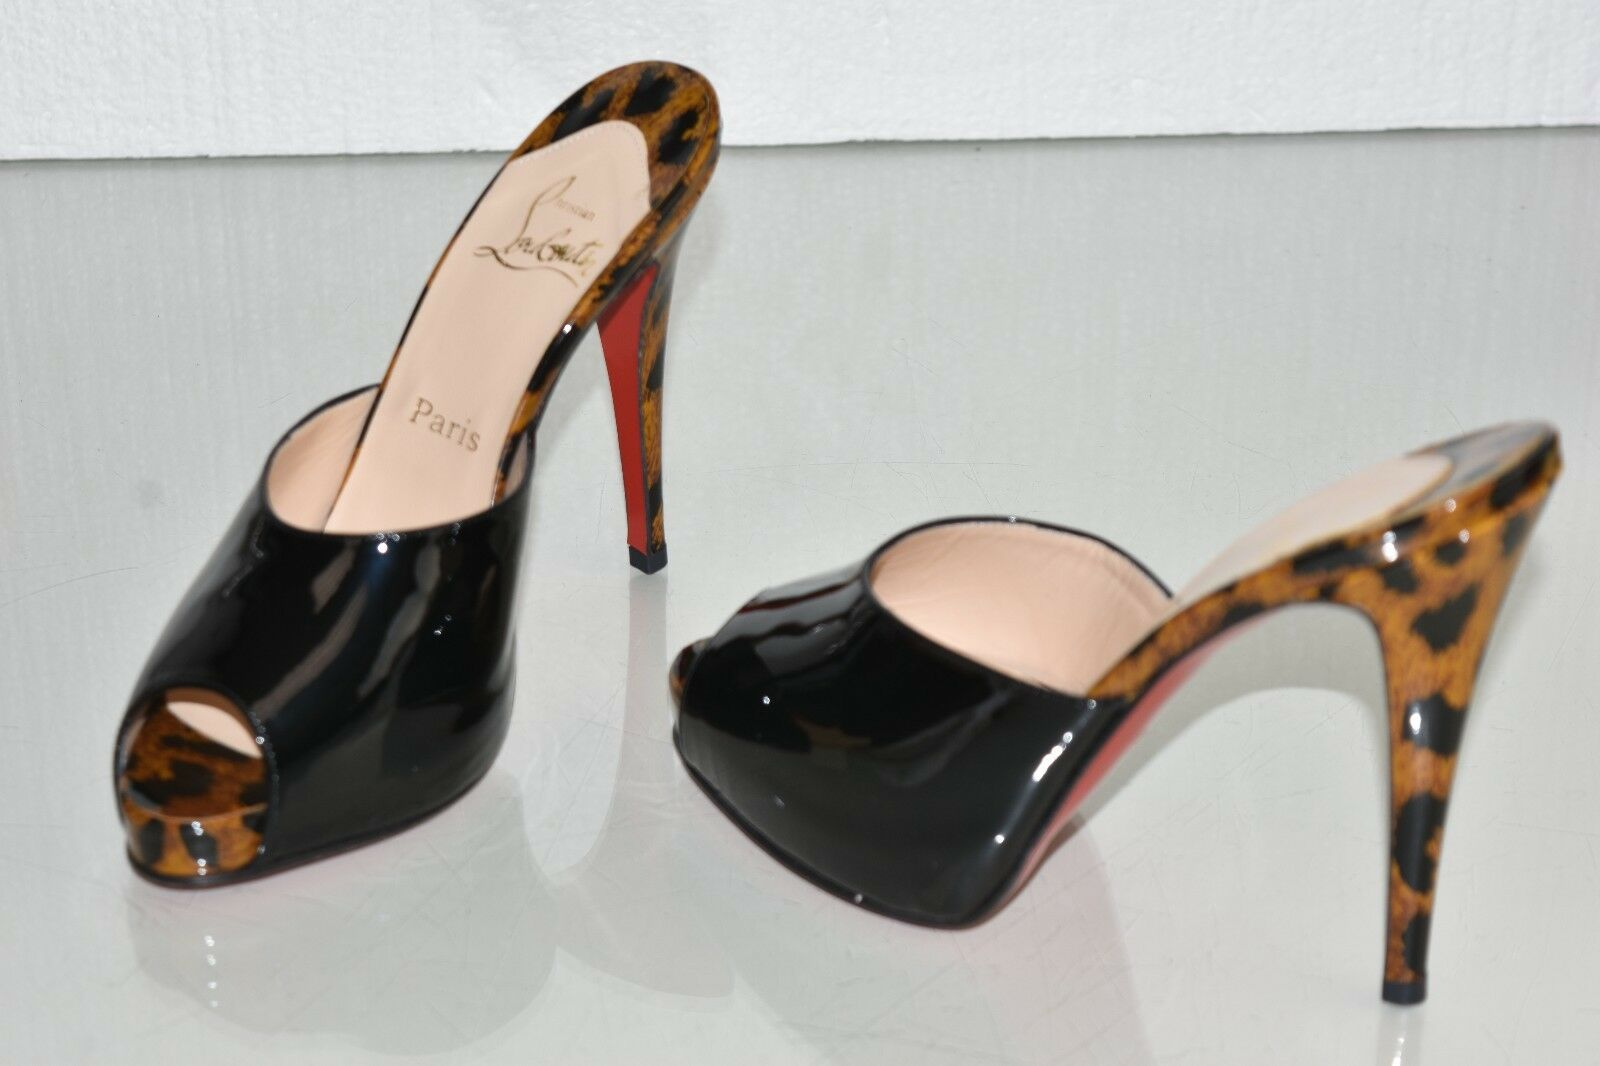 NEW Christian Louboutin SABOTAGE Slides Black Patent Patent Patent Brown Leopard Heel shoes 39 0191be